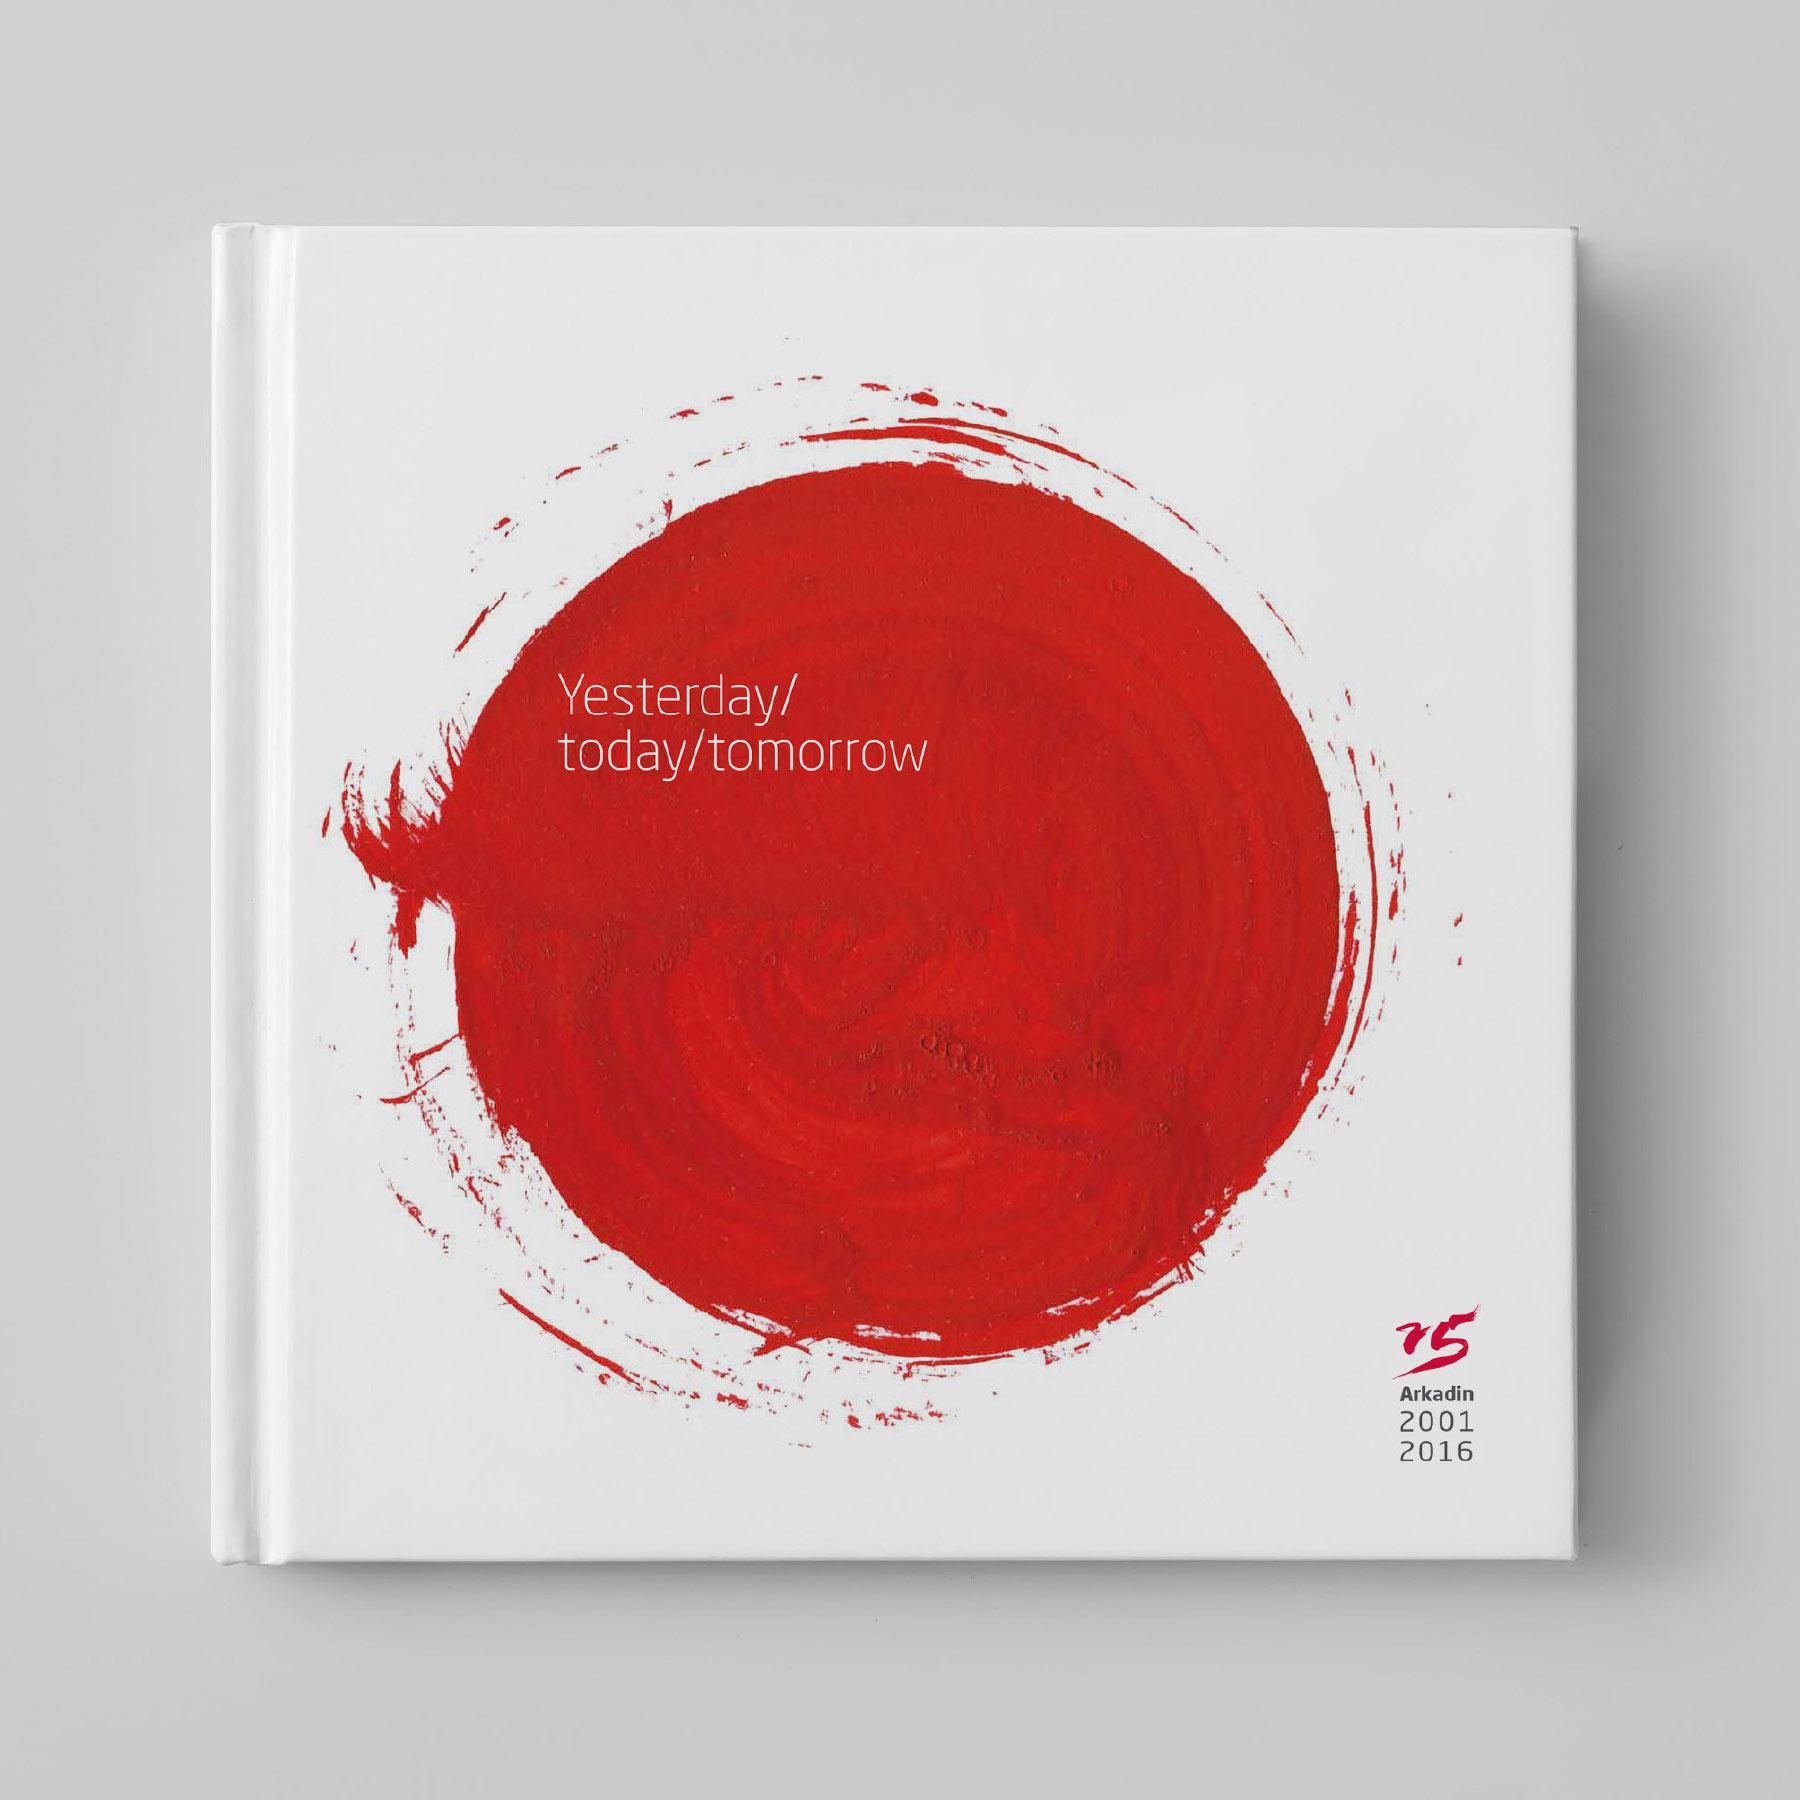 marketing book cover design arkadin